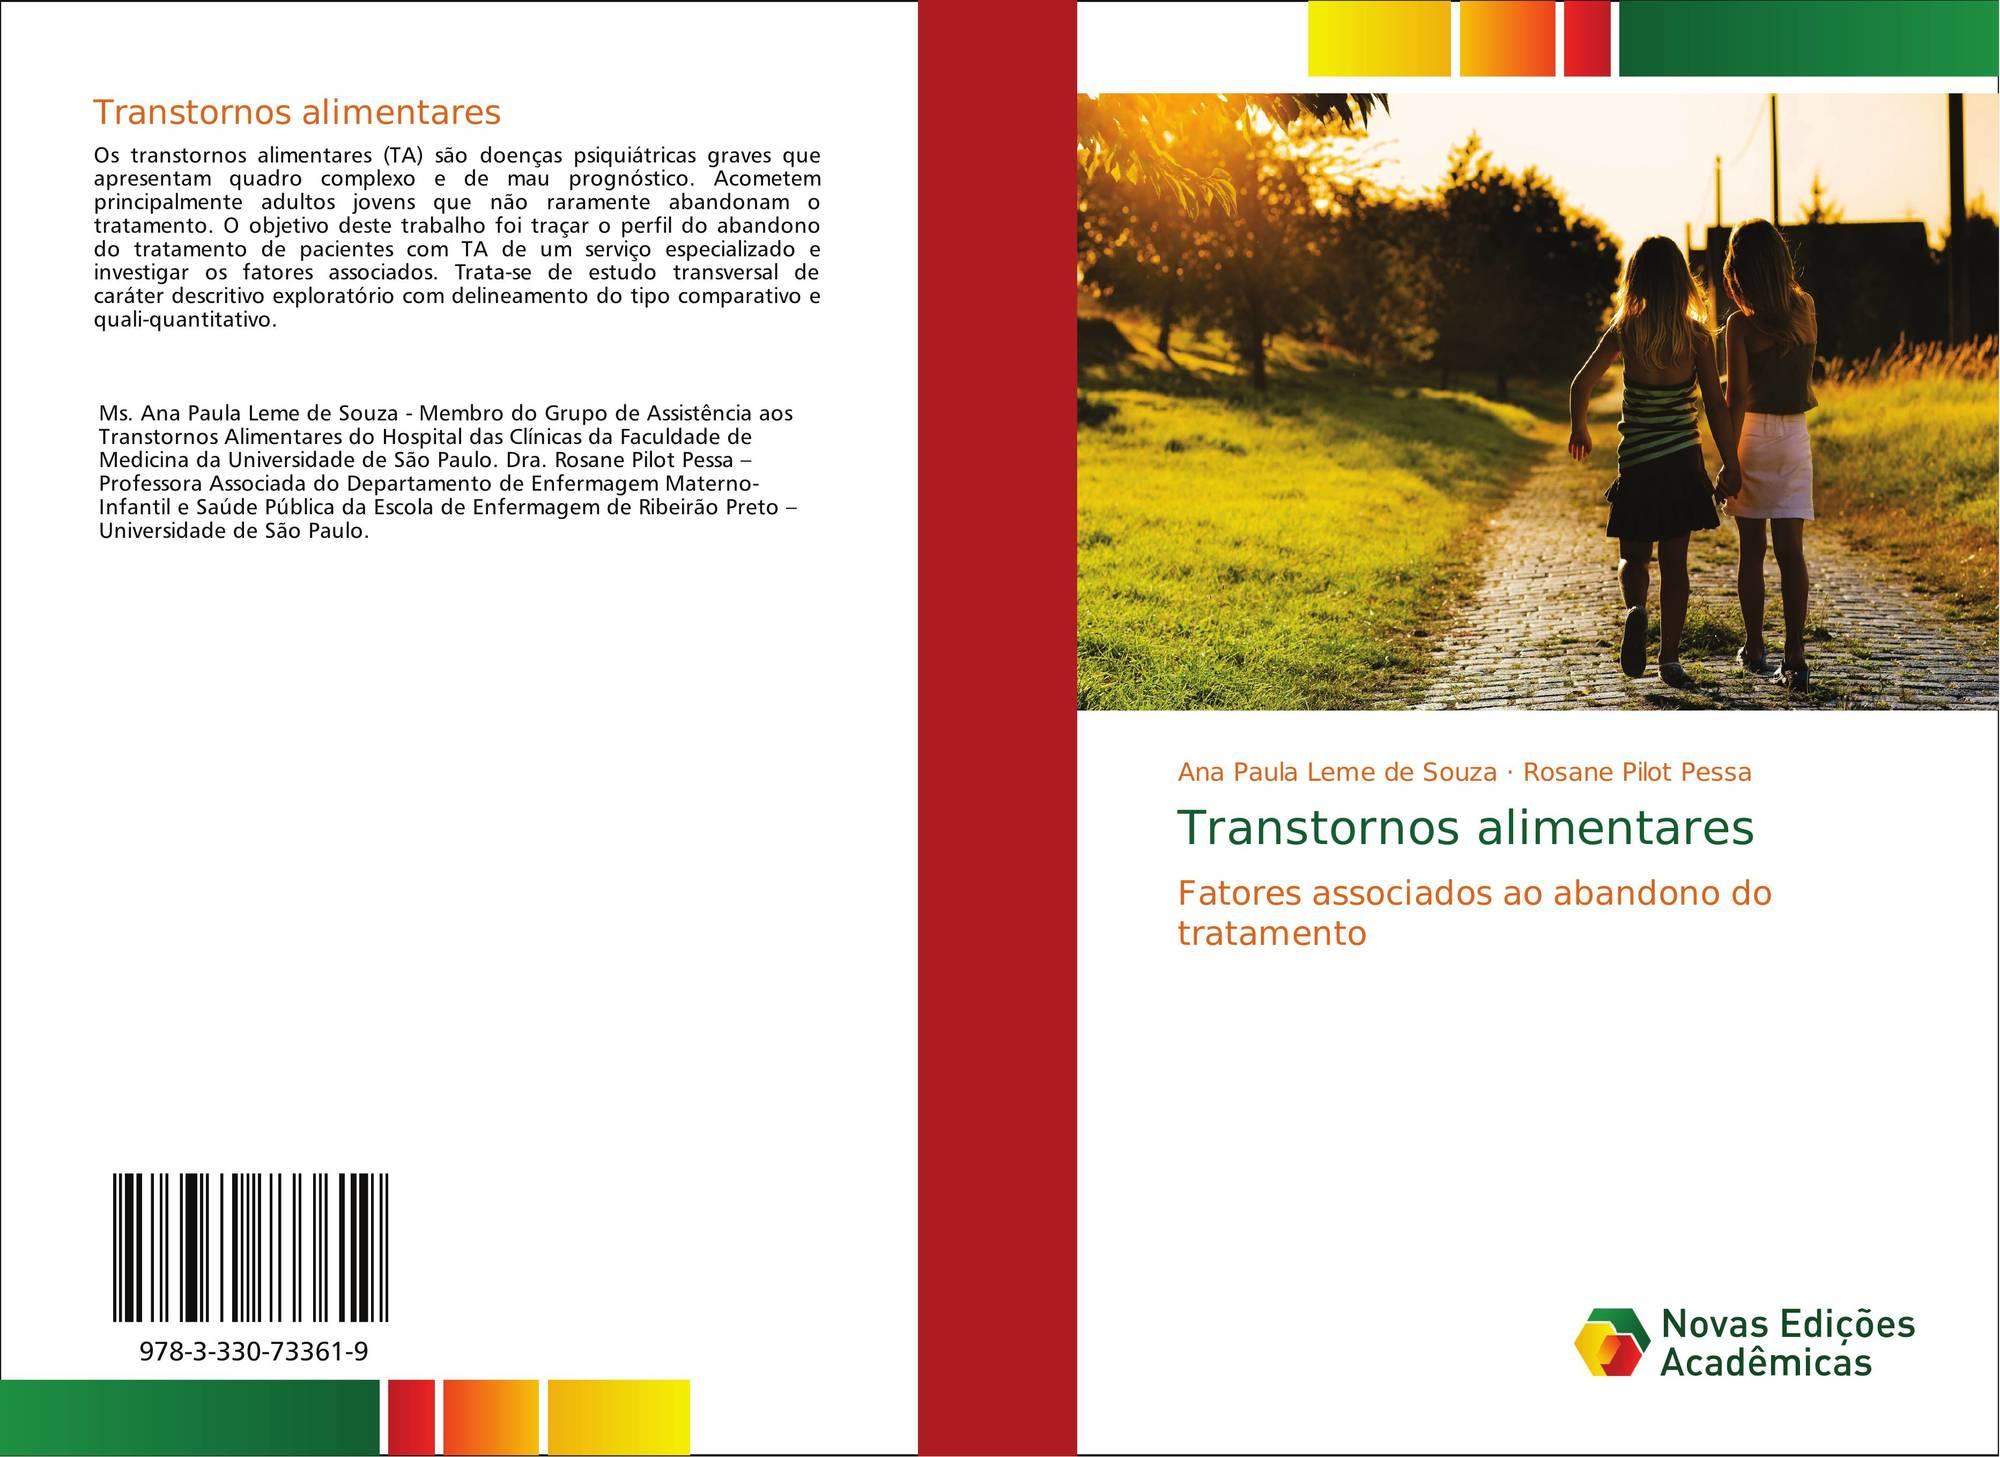 Ana Paula Leme transtornos alimentares, 978-3-330-73361-9, 3330733616